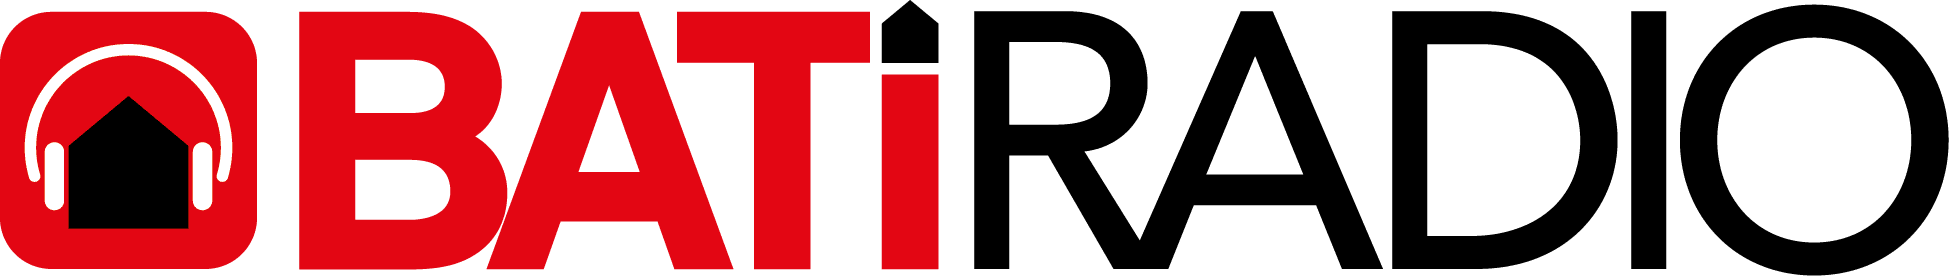 podcast-batiradio-logo